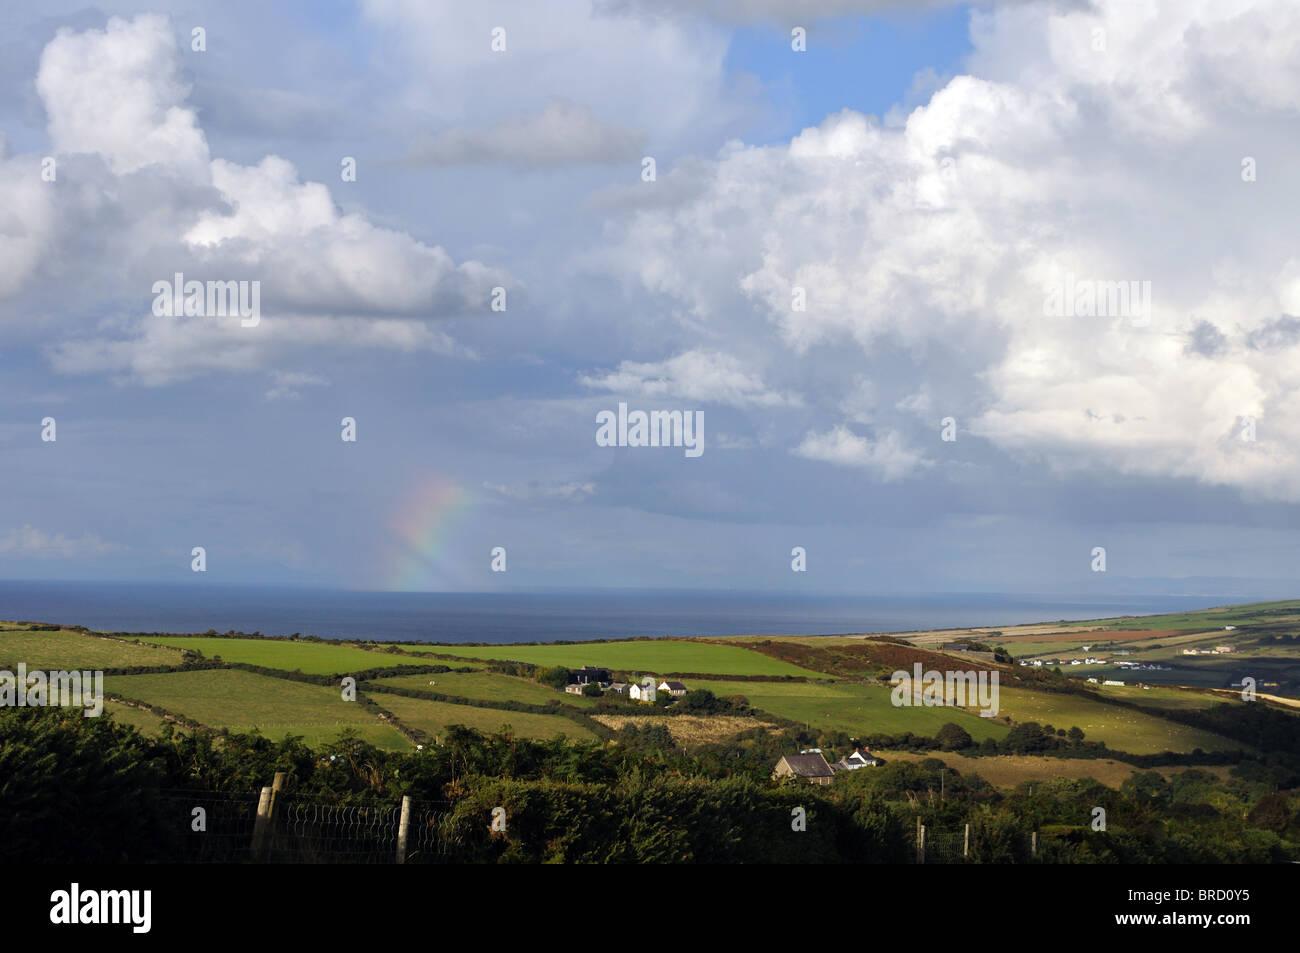 Rainbow over Cardigan Bay, St Dogmaels, Pembrokeshire, Wales, United Kingdom - Stock Image